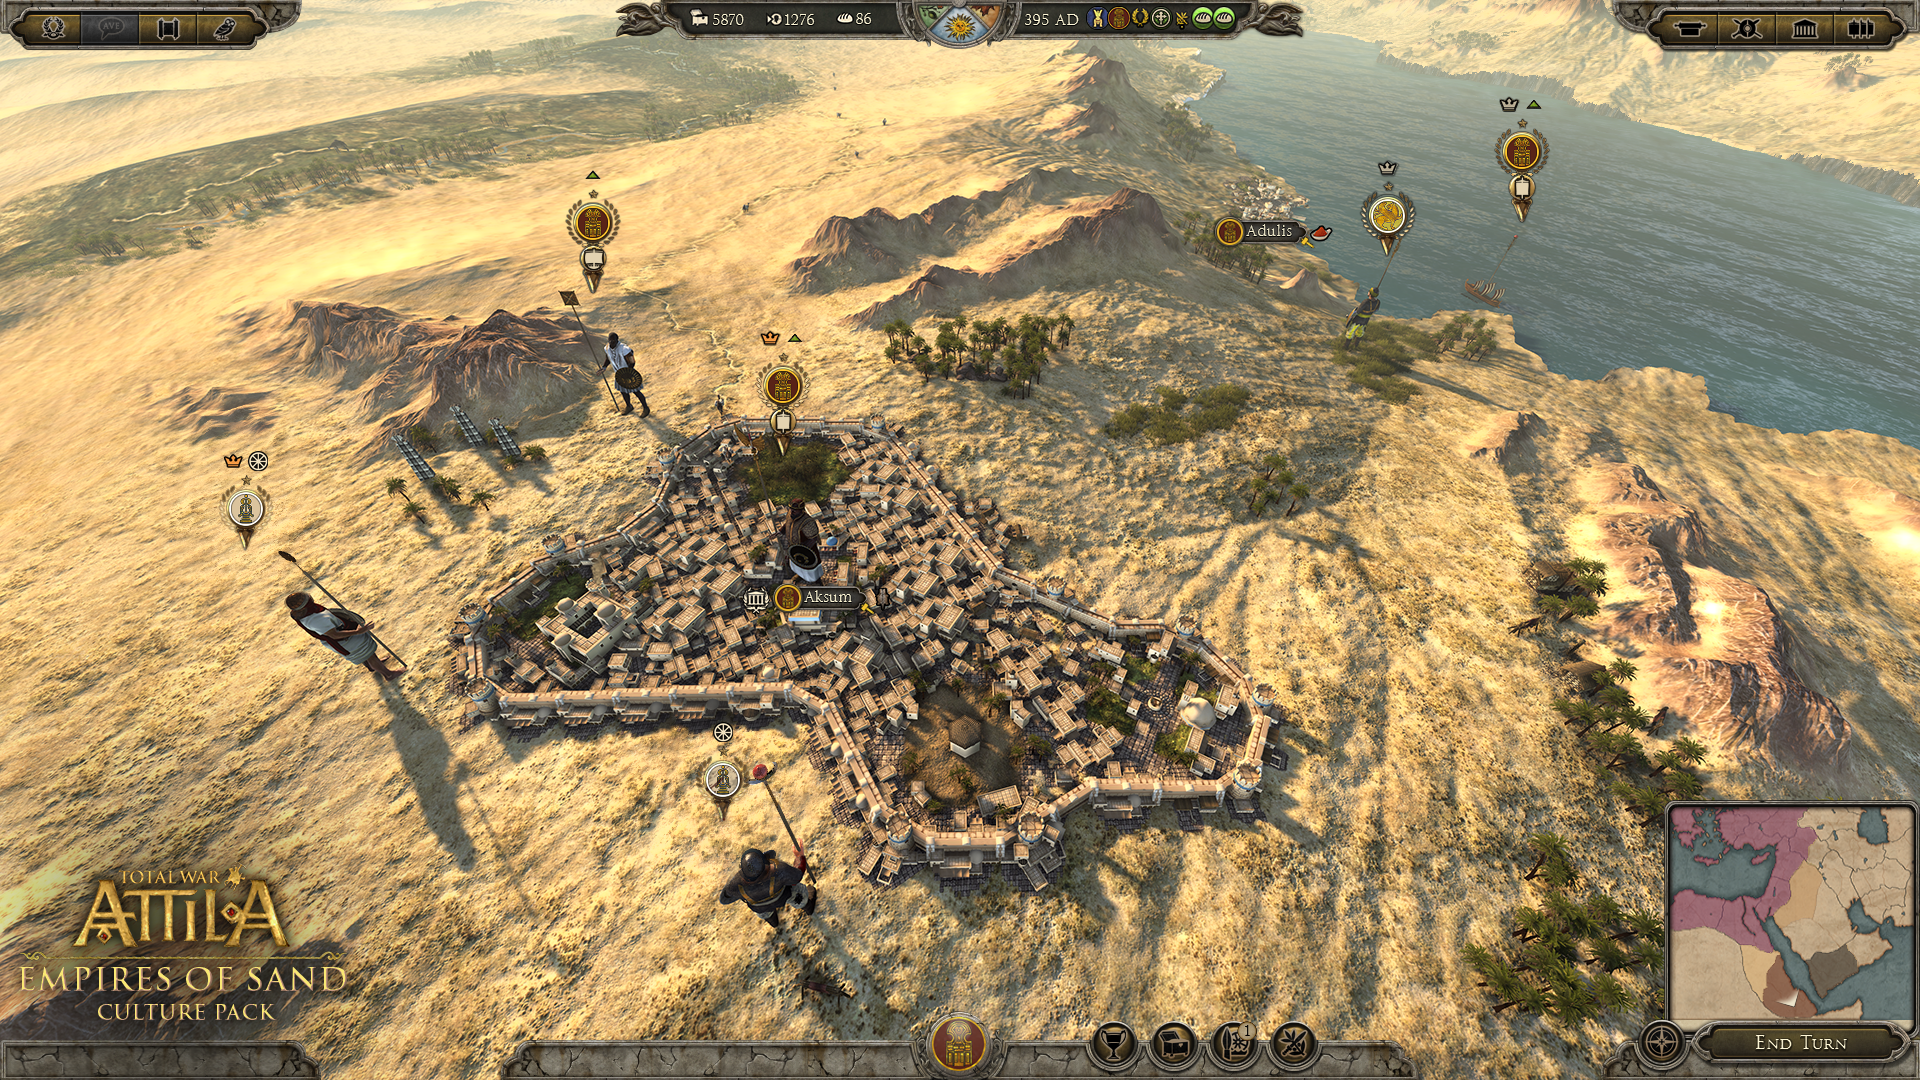 Total War: ATTILA - Empires of Sand Culture Pack [PC Code